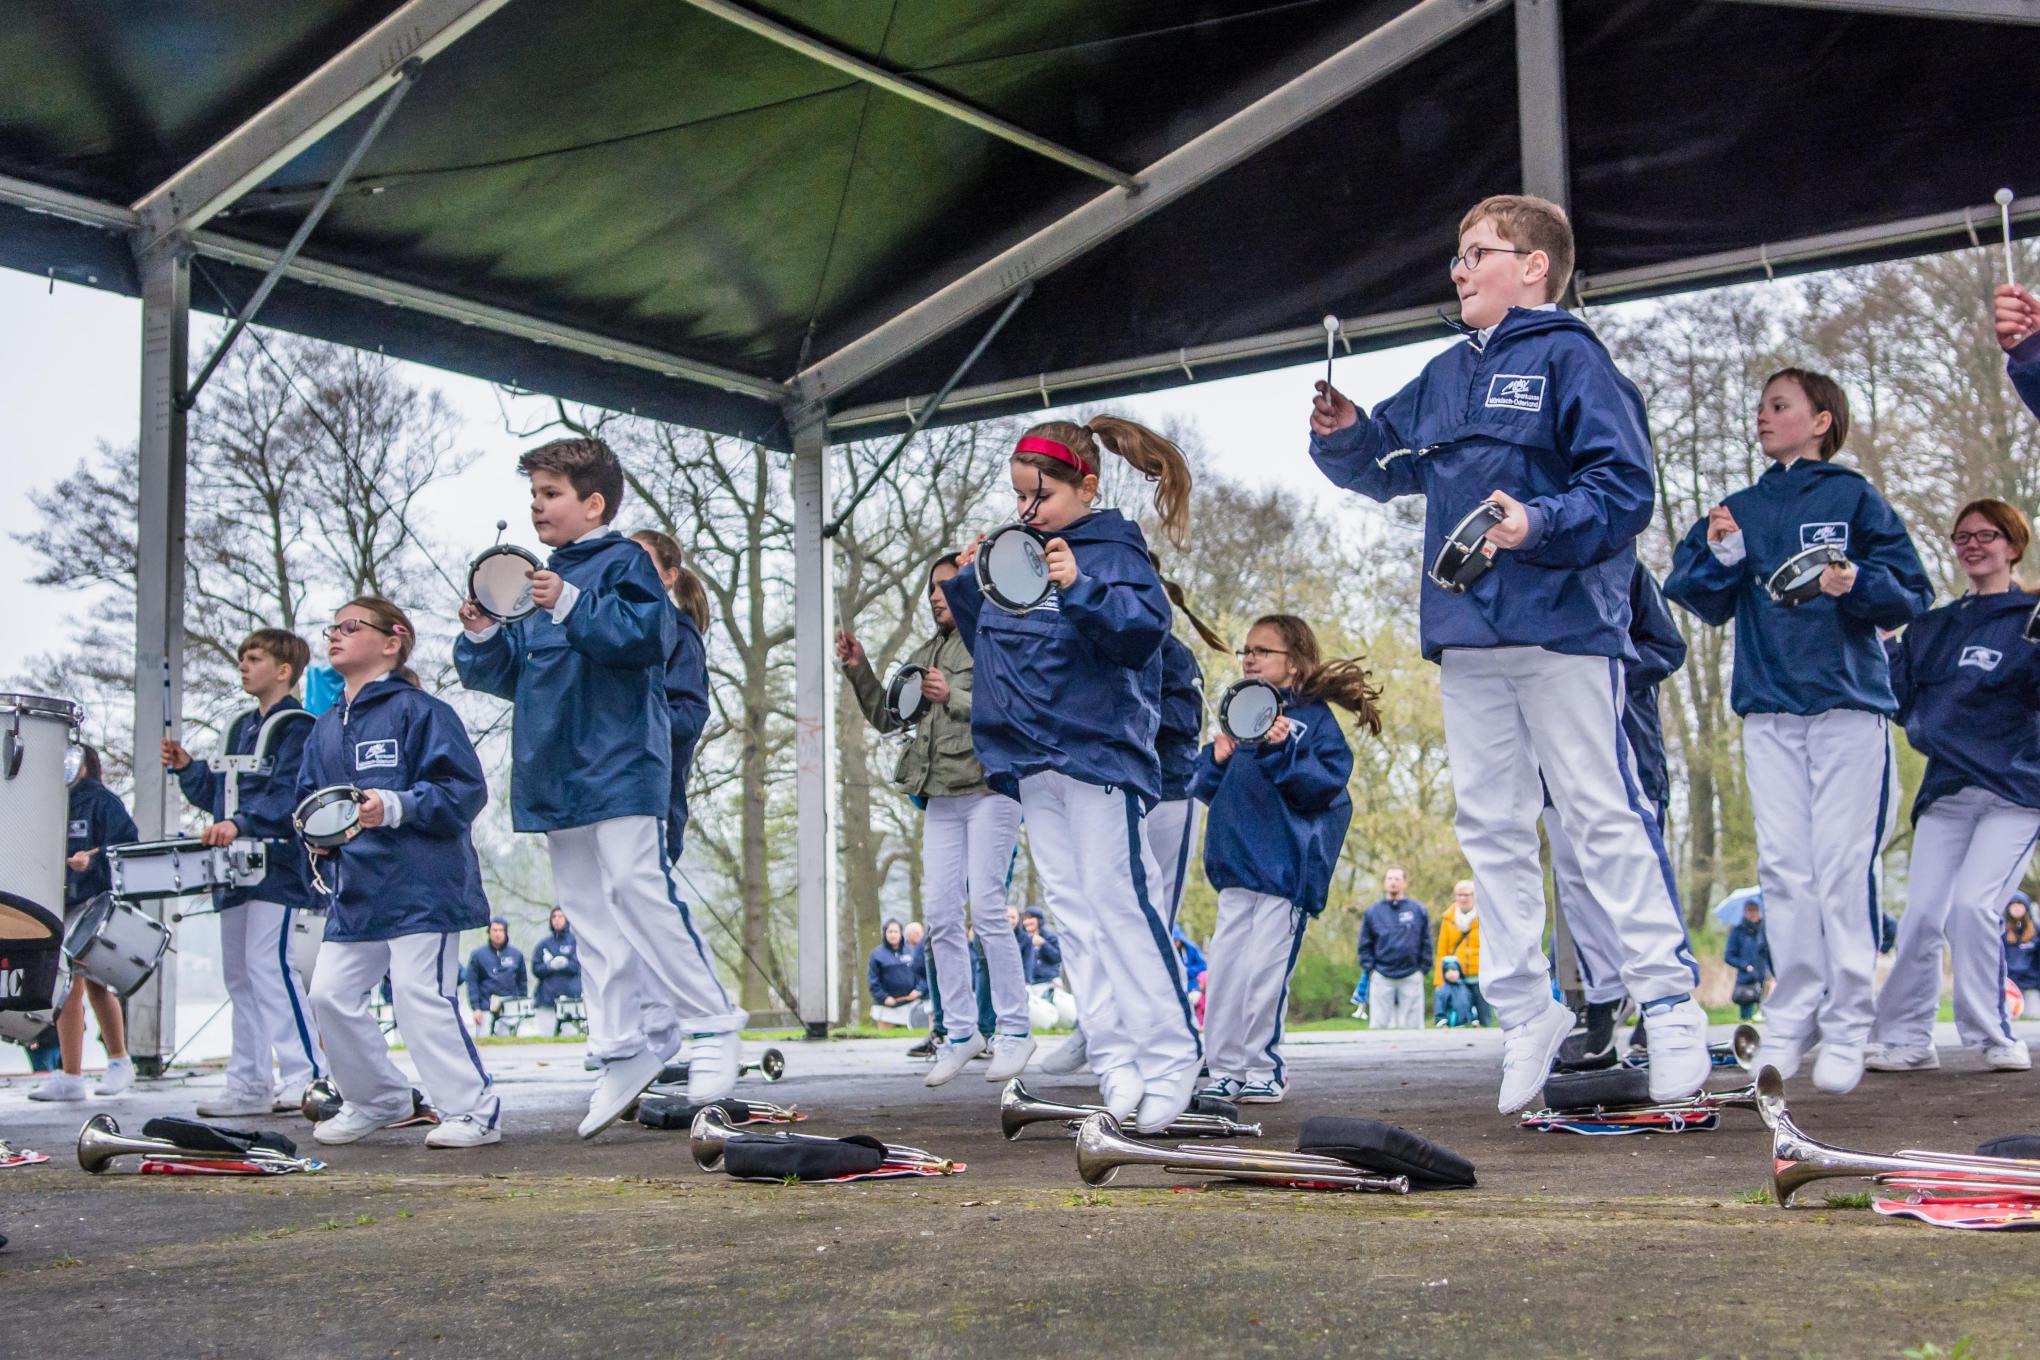 musik-im-park-2017-strausberg